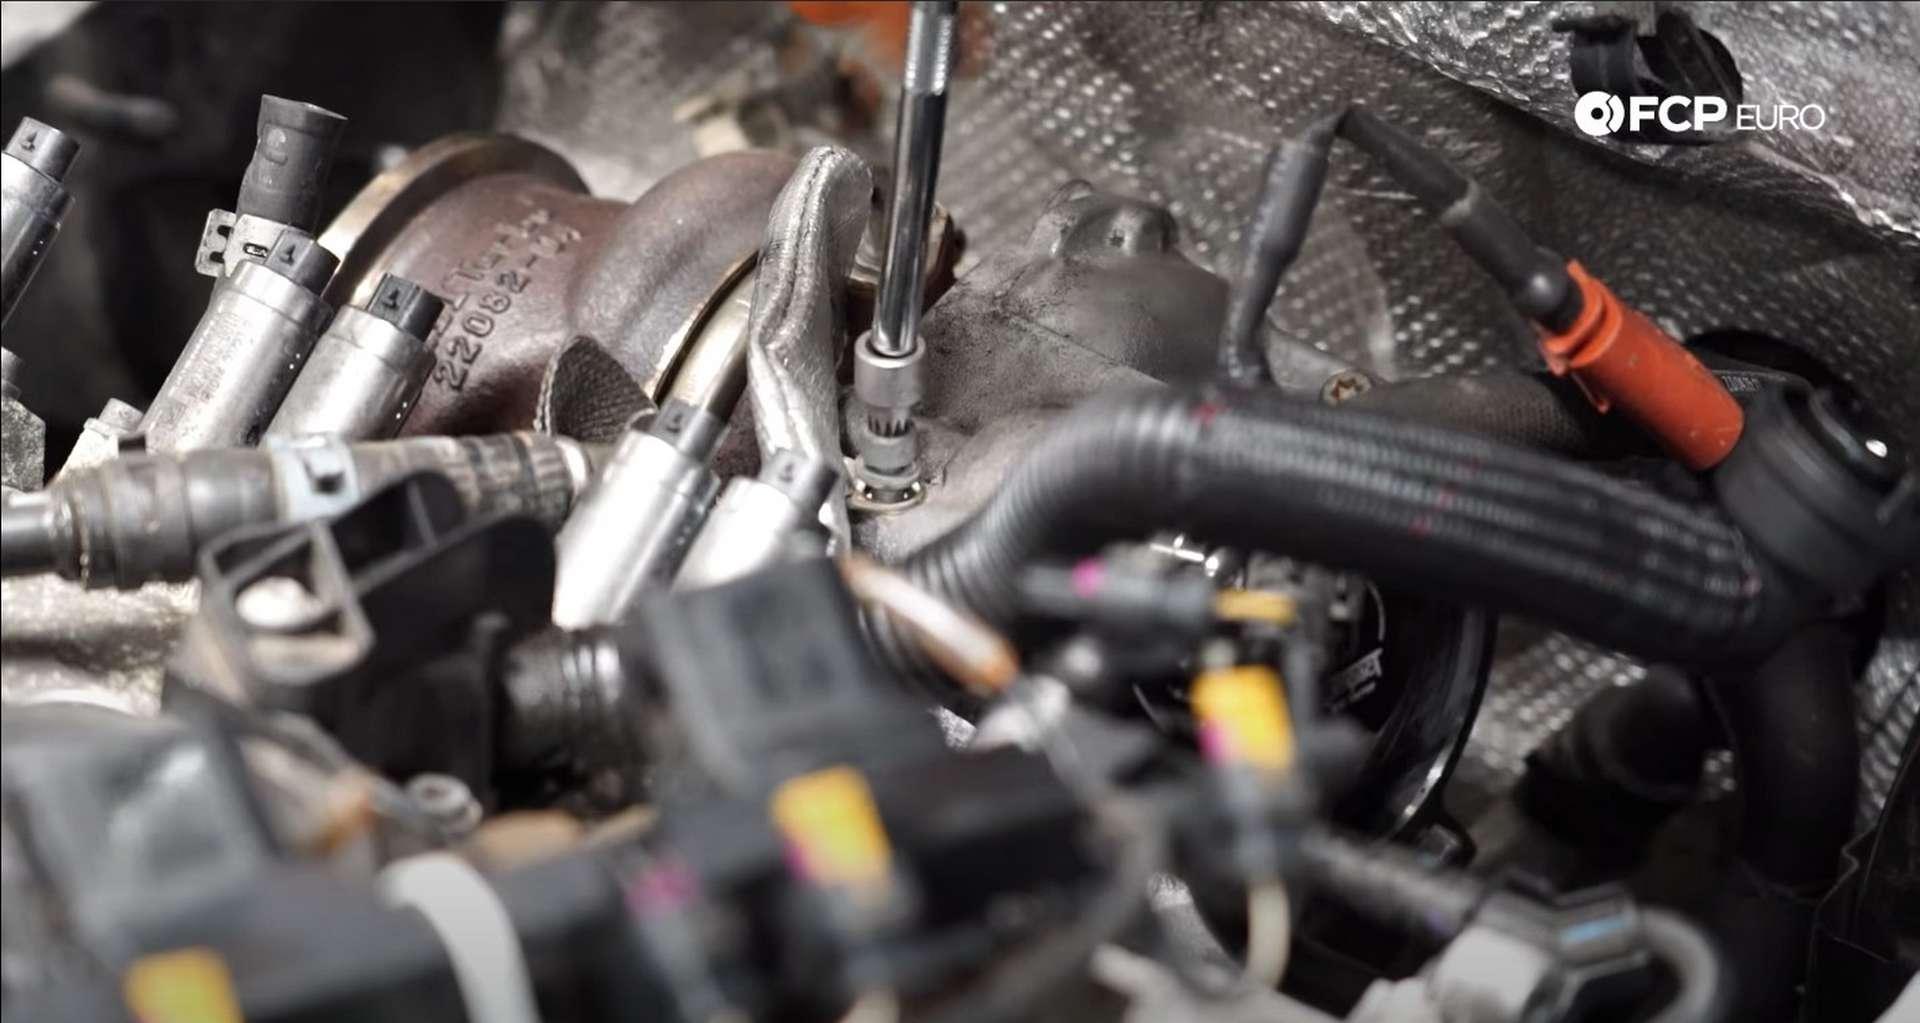 DIY MK7 VW GTI Turbocharger Upgrade removing oil feed line bracket bolt